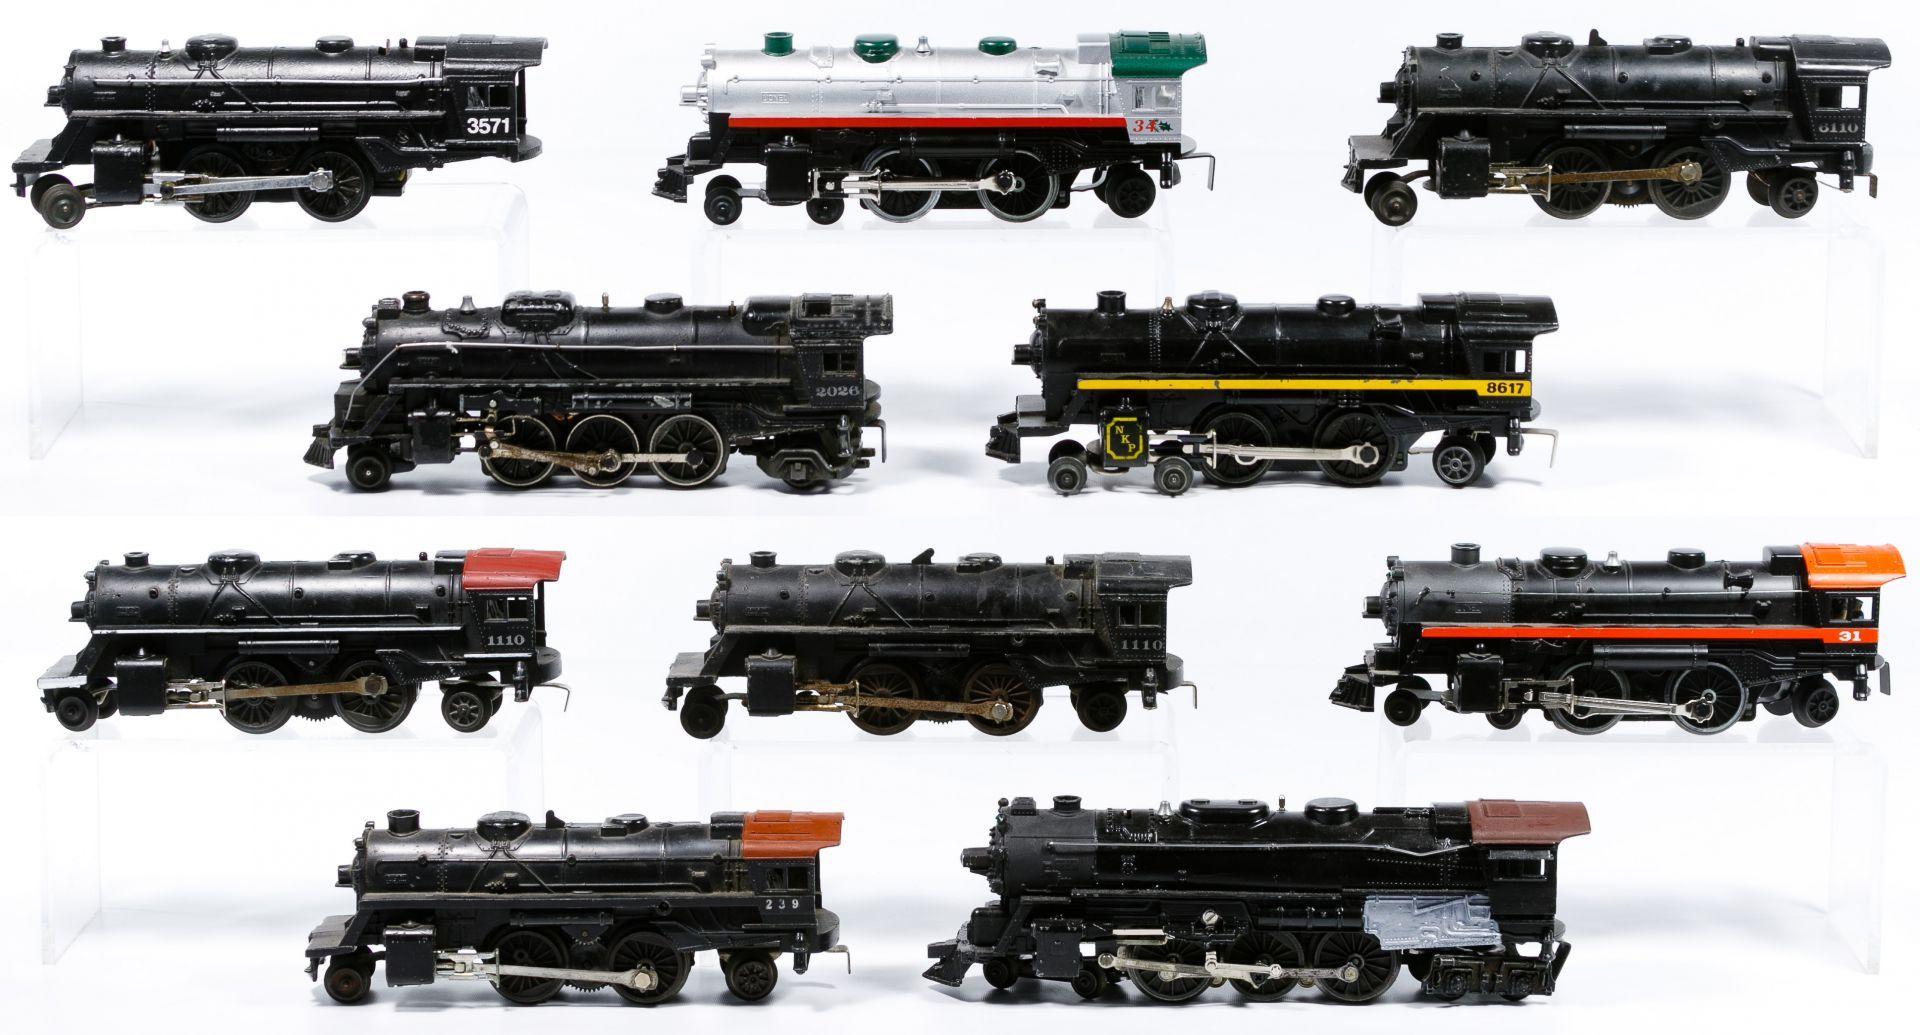 Lot 281 Lionel Model Train Steam Locomotive Assortment Ten O Gauge Metal Locomotives Including Two Scout 2 4 2 Locomo Model Trains Locomotive Halloween Train